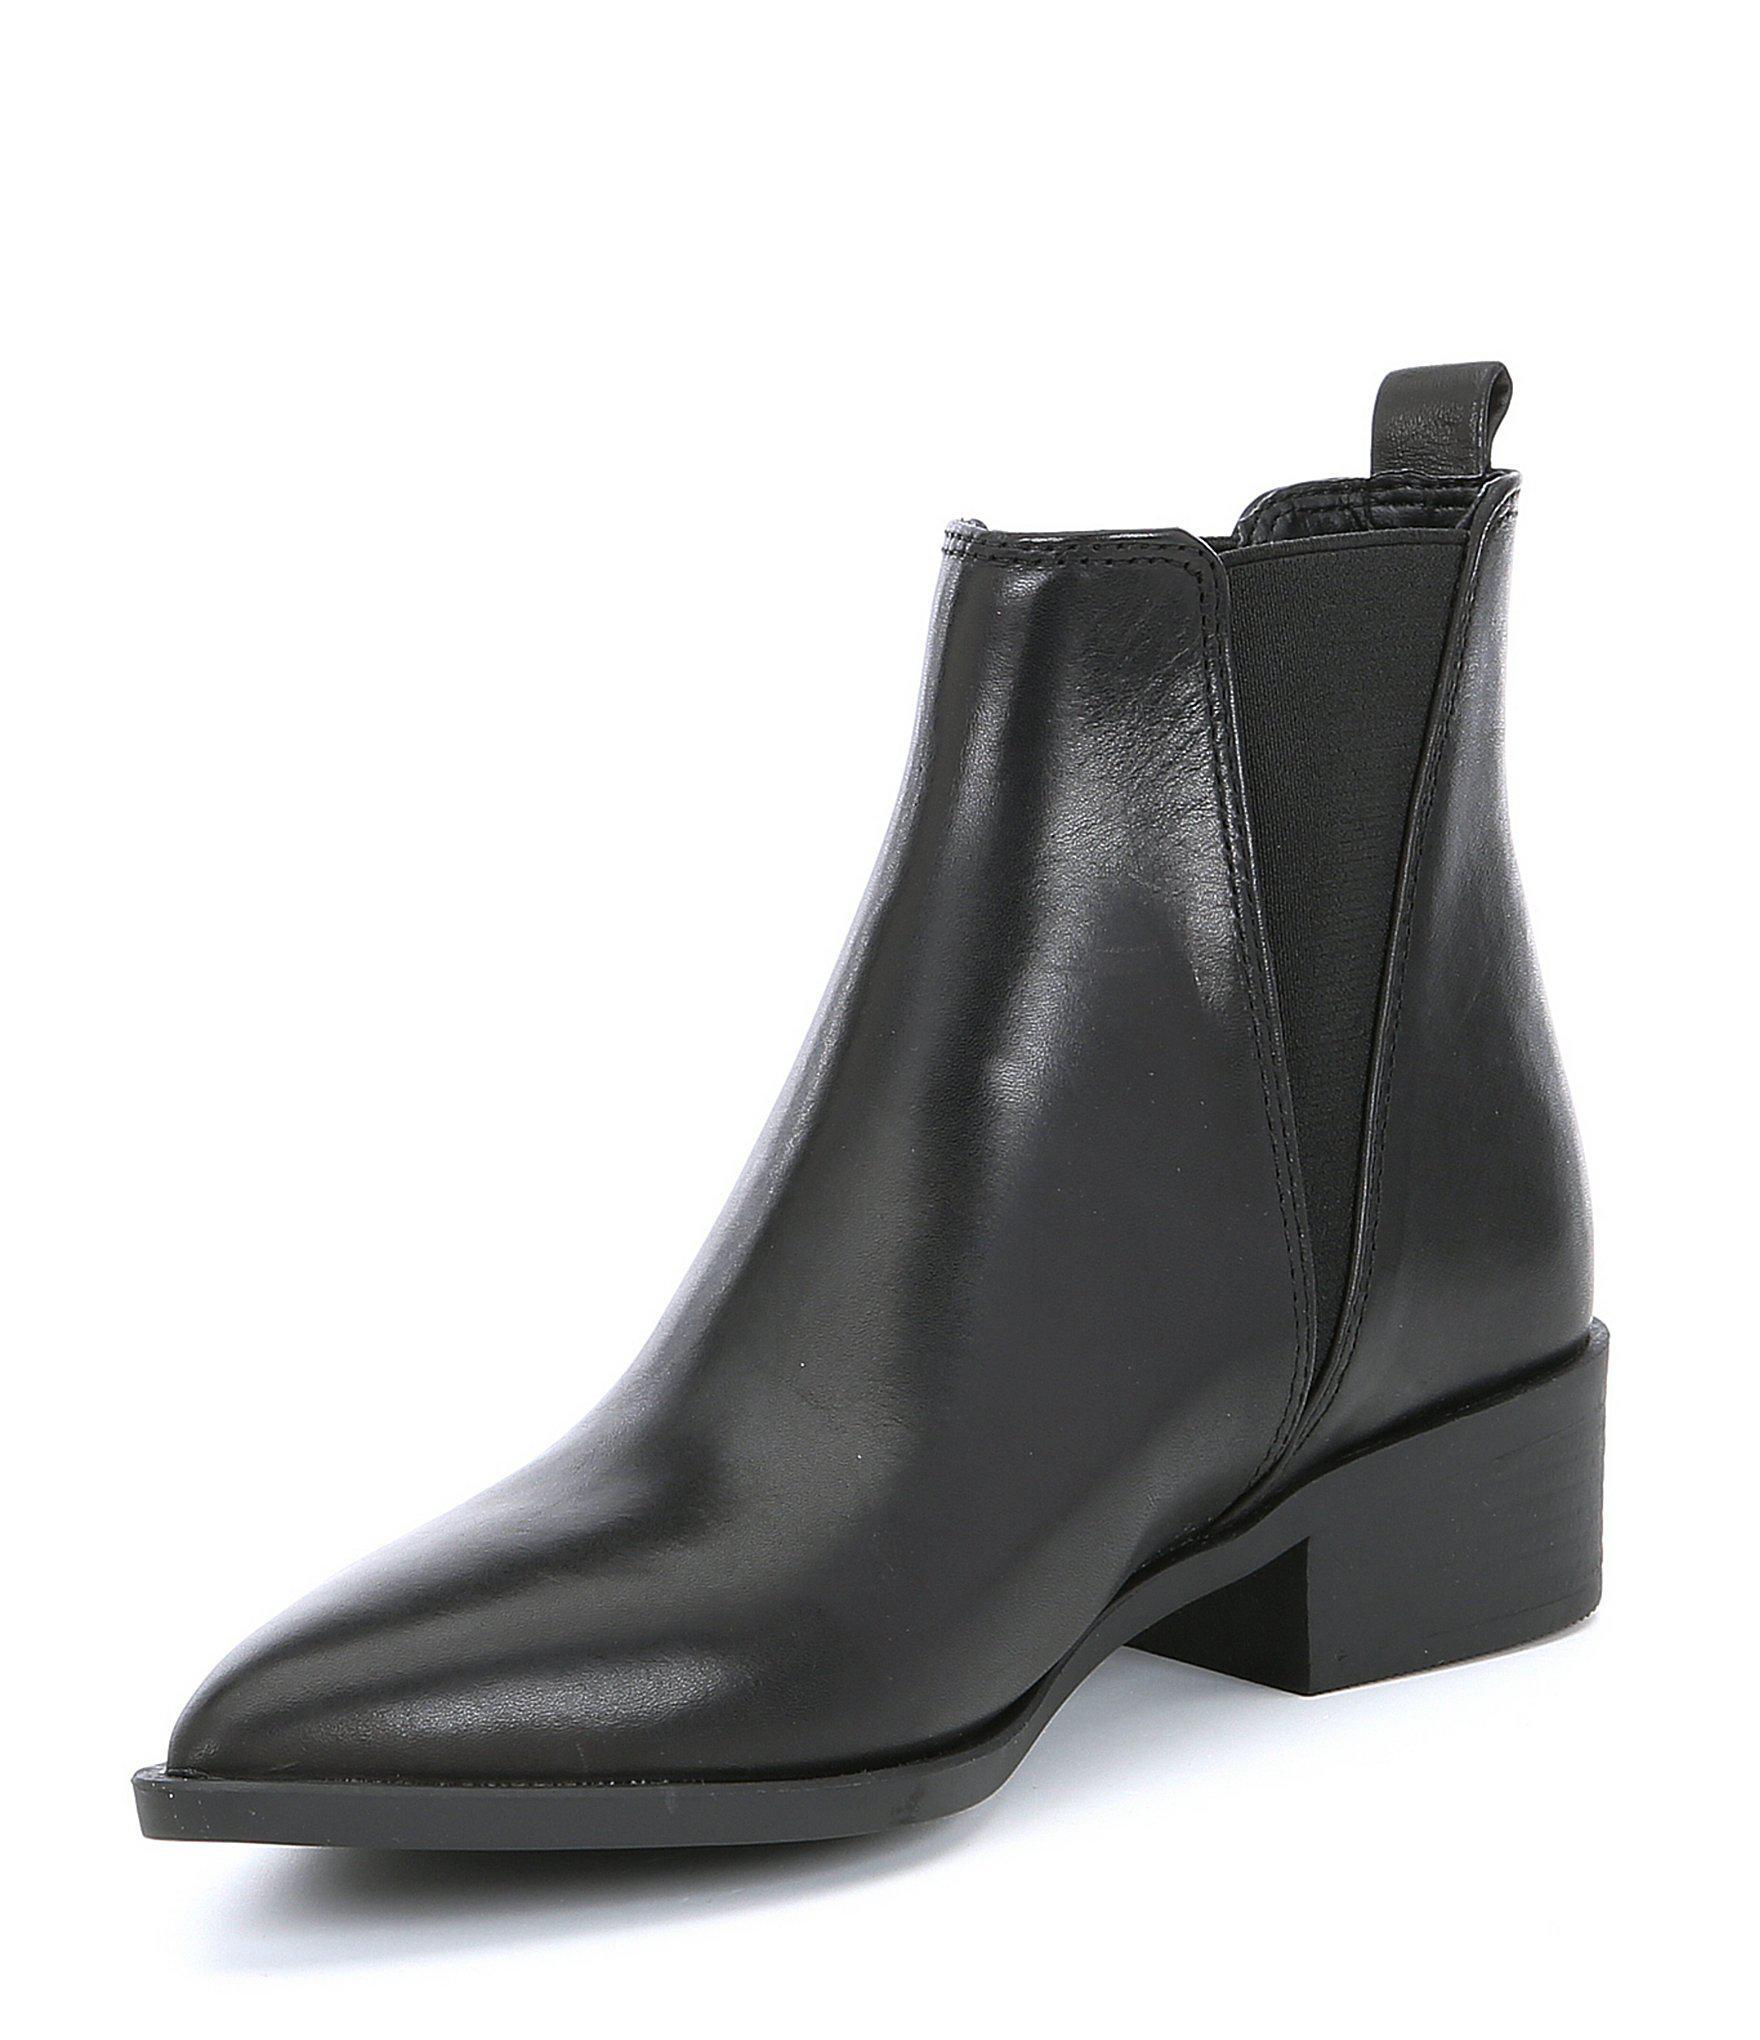 1e60f9a9ea51 Steve Madden Jerry Leather Block Heel Booties in Black - Lyst